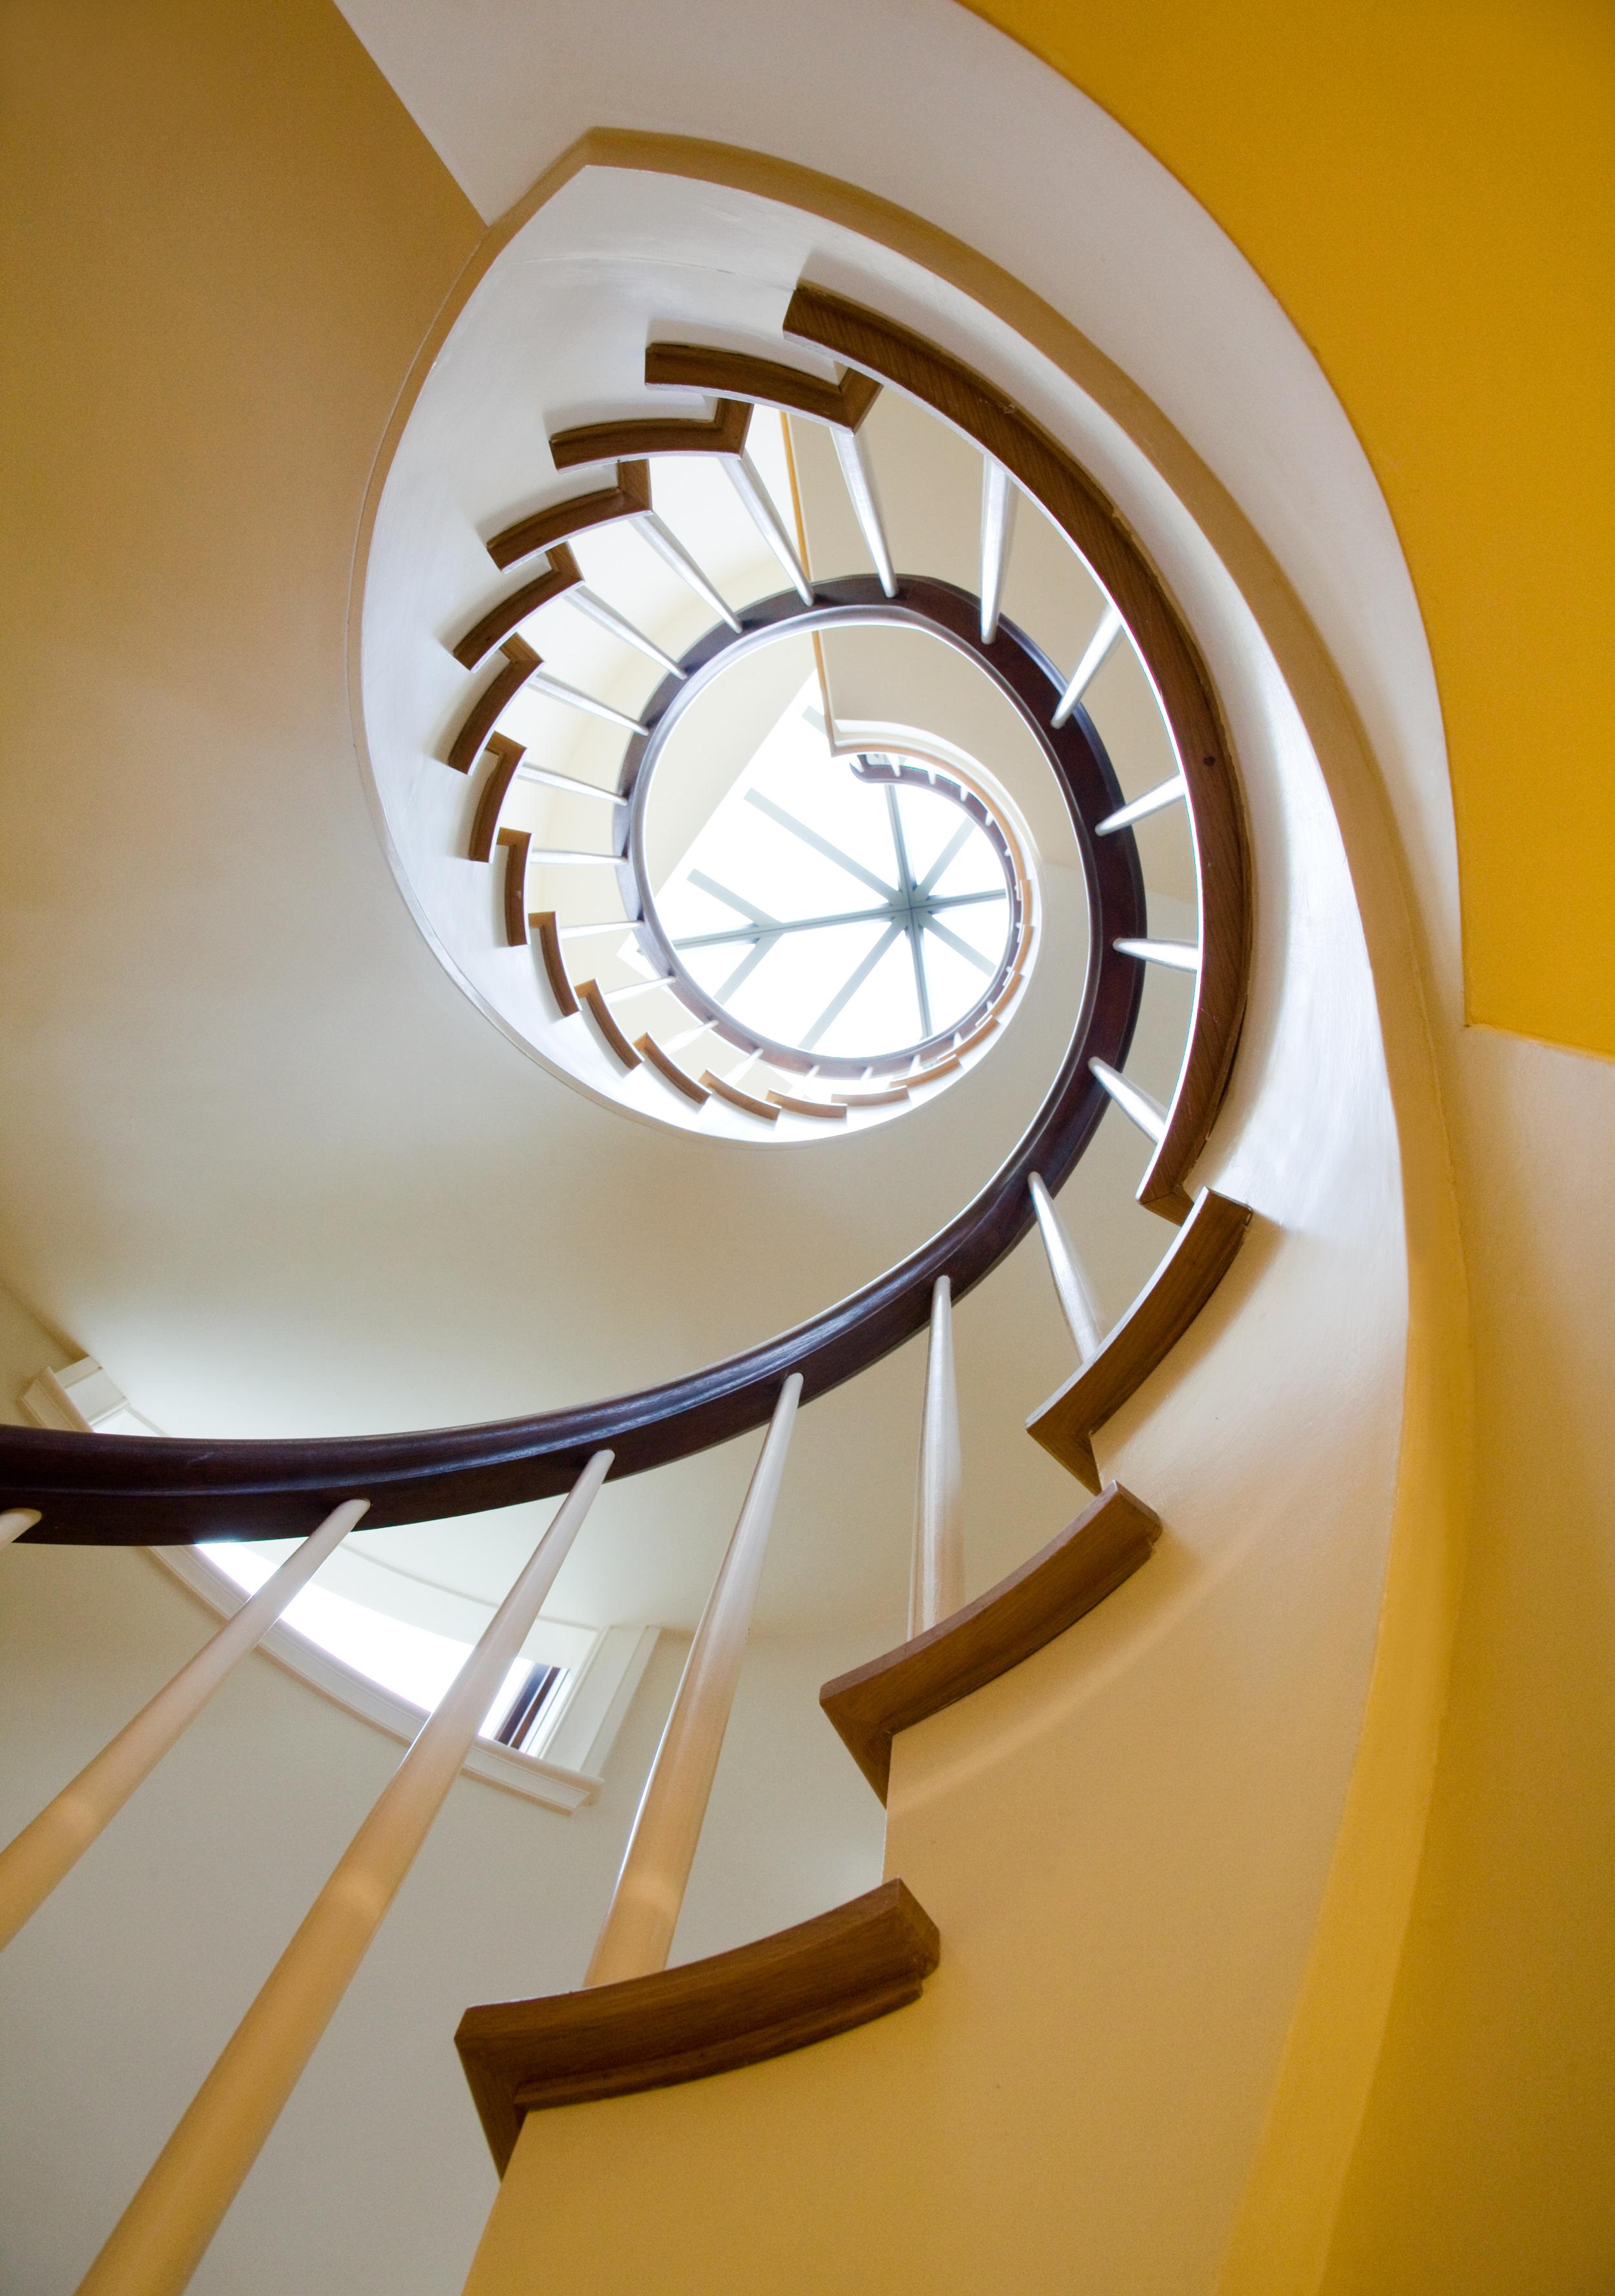 Cape_Cod_Doreve_stairs_4.jpg